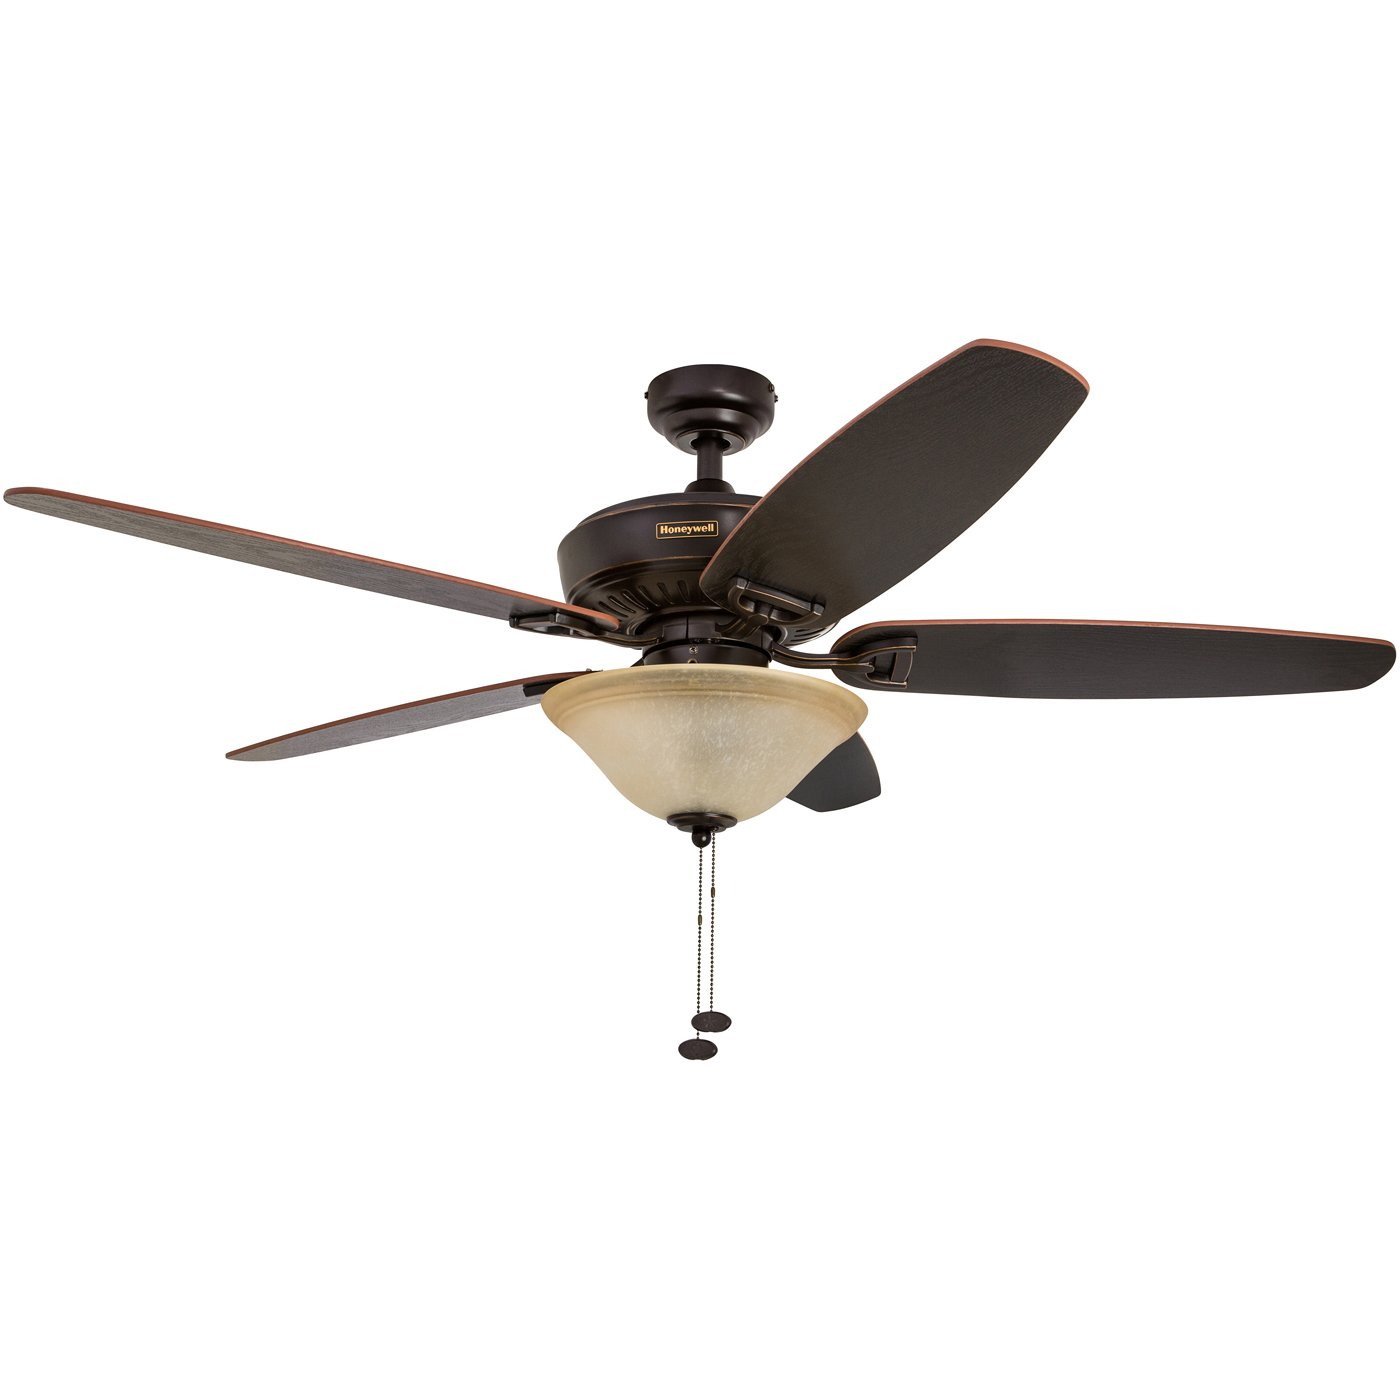 Honeywell Belmar 52-Inch Ceiling Fan with Sunset Glass Light Kit, Five Reversible Cimarron/Burnt Oak Blades, Oil-Rubbed Bronze